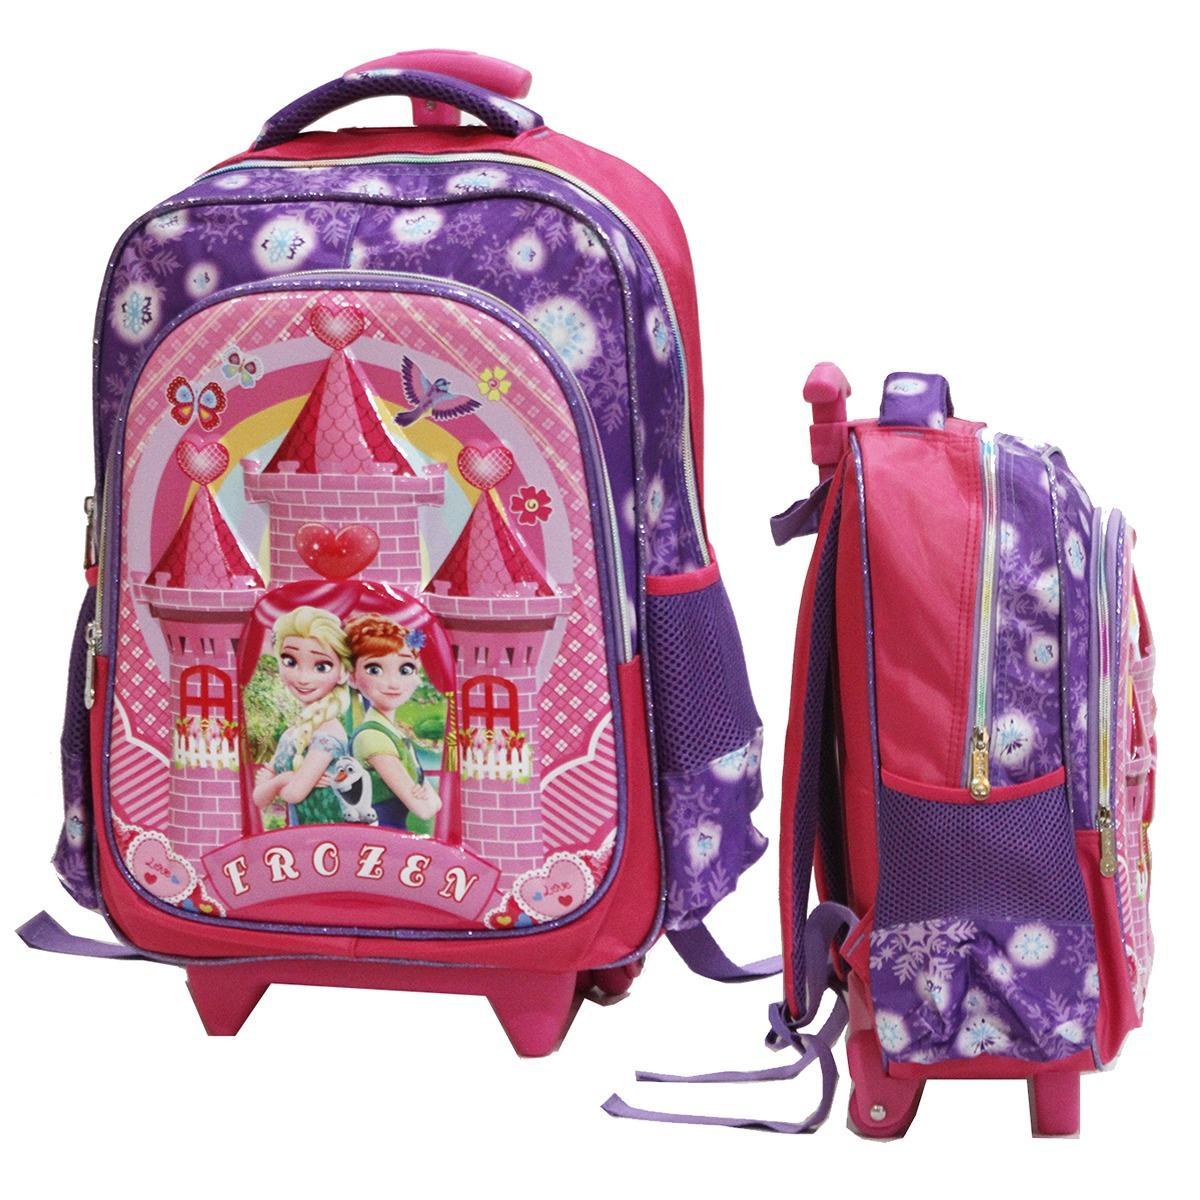 Beli Onlan Frozen Fever Flower 6D Timbul Tas Trolley Anak Sekolah Sd Import Purple Secara Angsuran